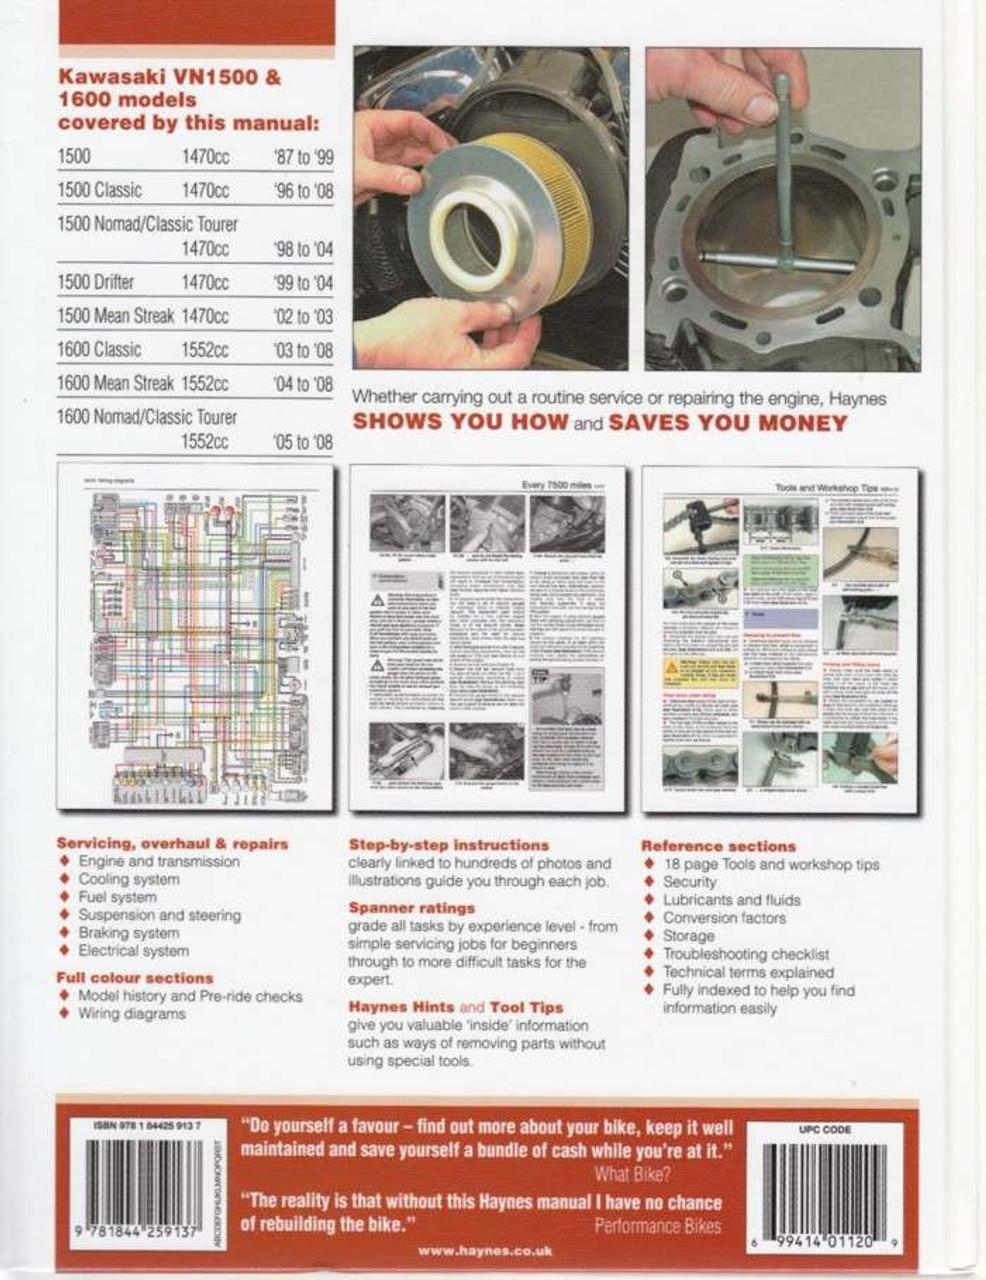 Kawasaki Vulcan 1500 & 1600 1987 - 2008 Workshop Manual on